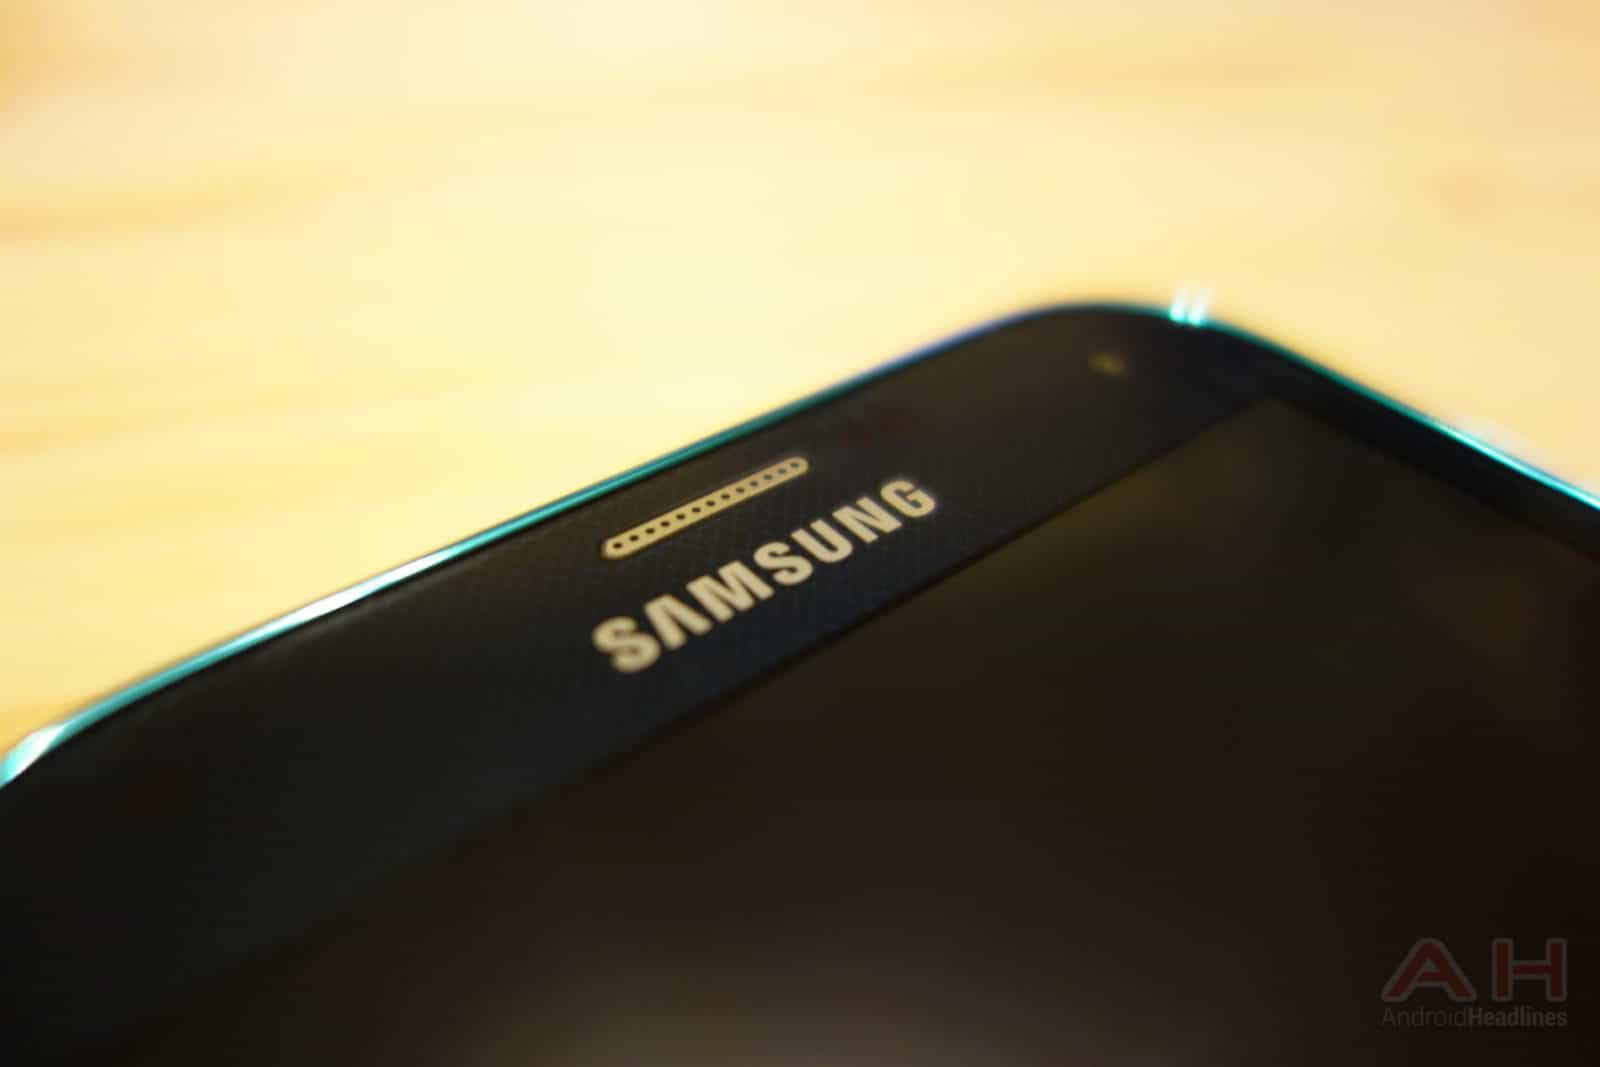 Samsung-Galaxy-S5-Sport-AH-1